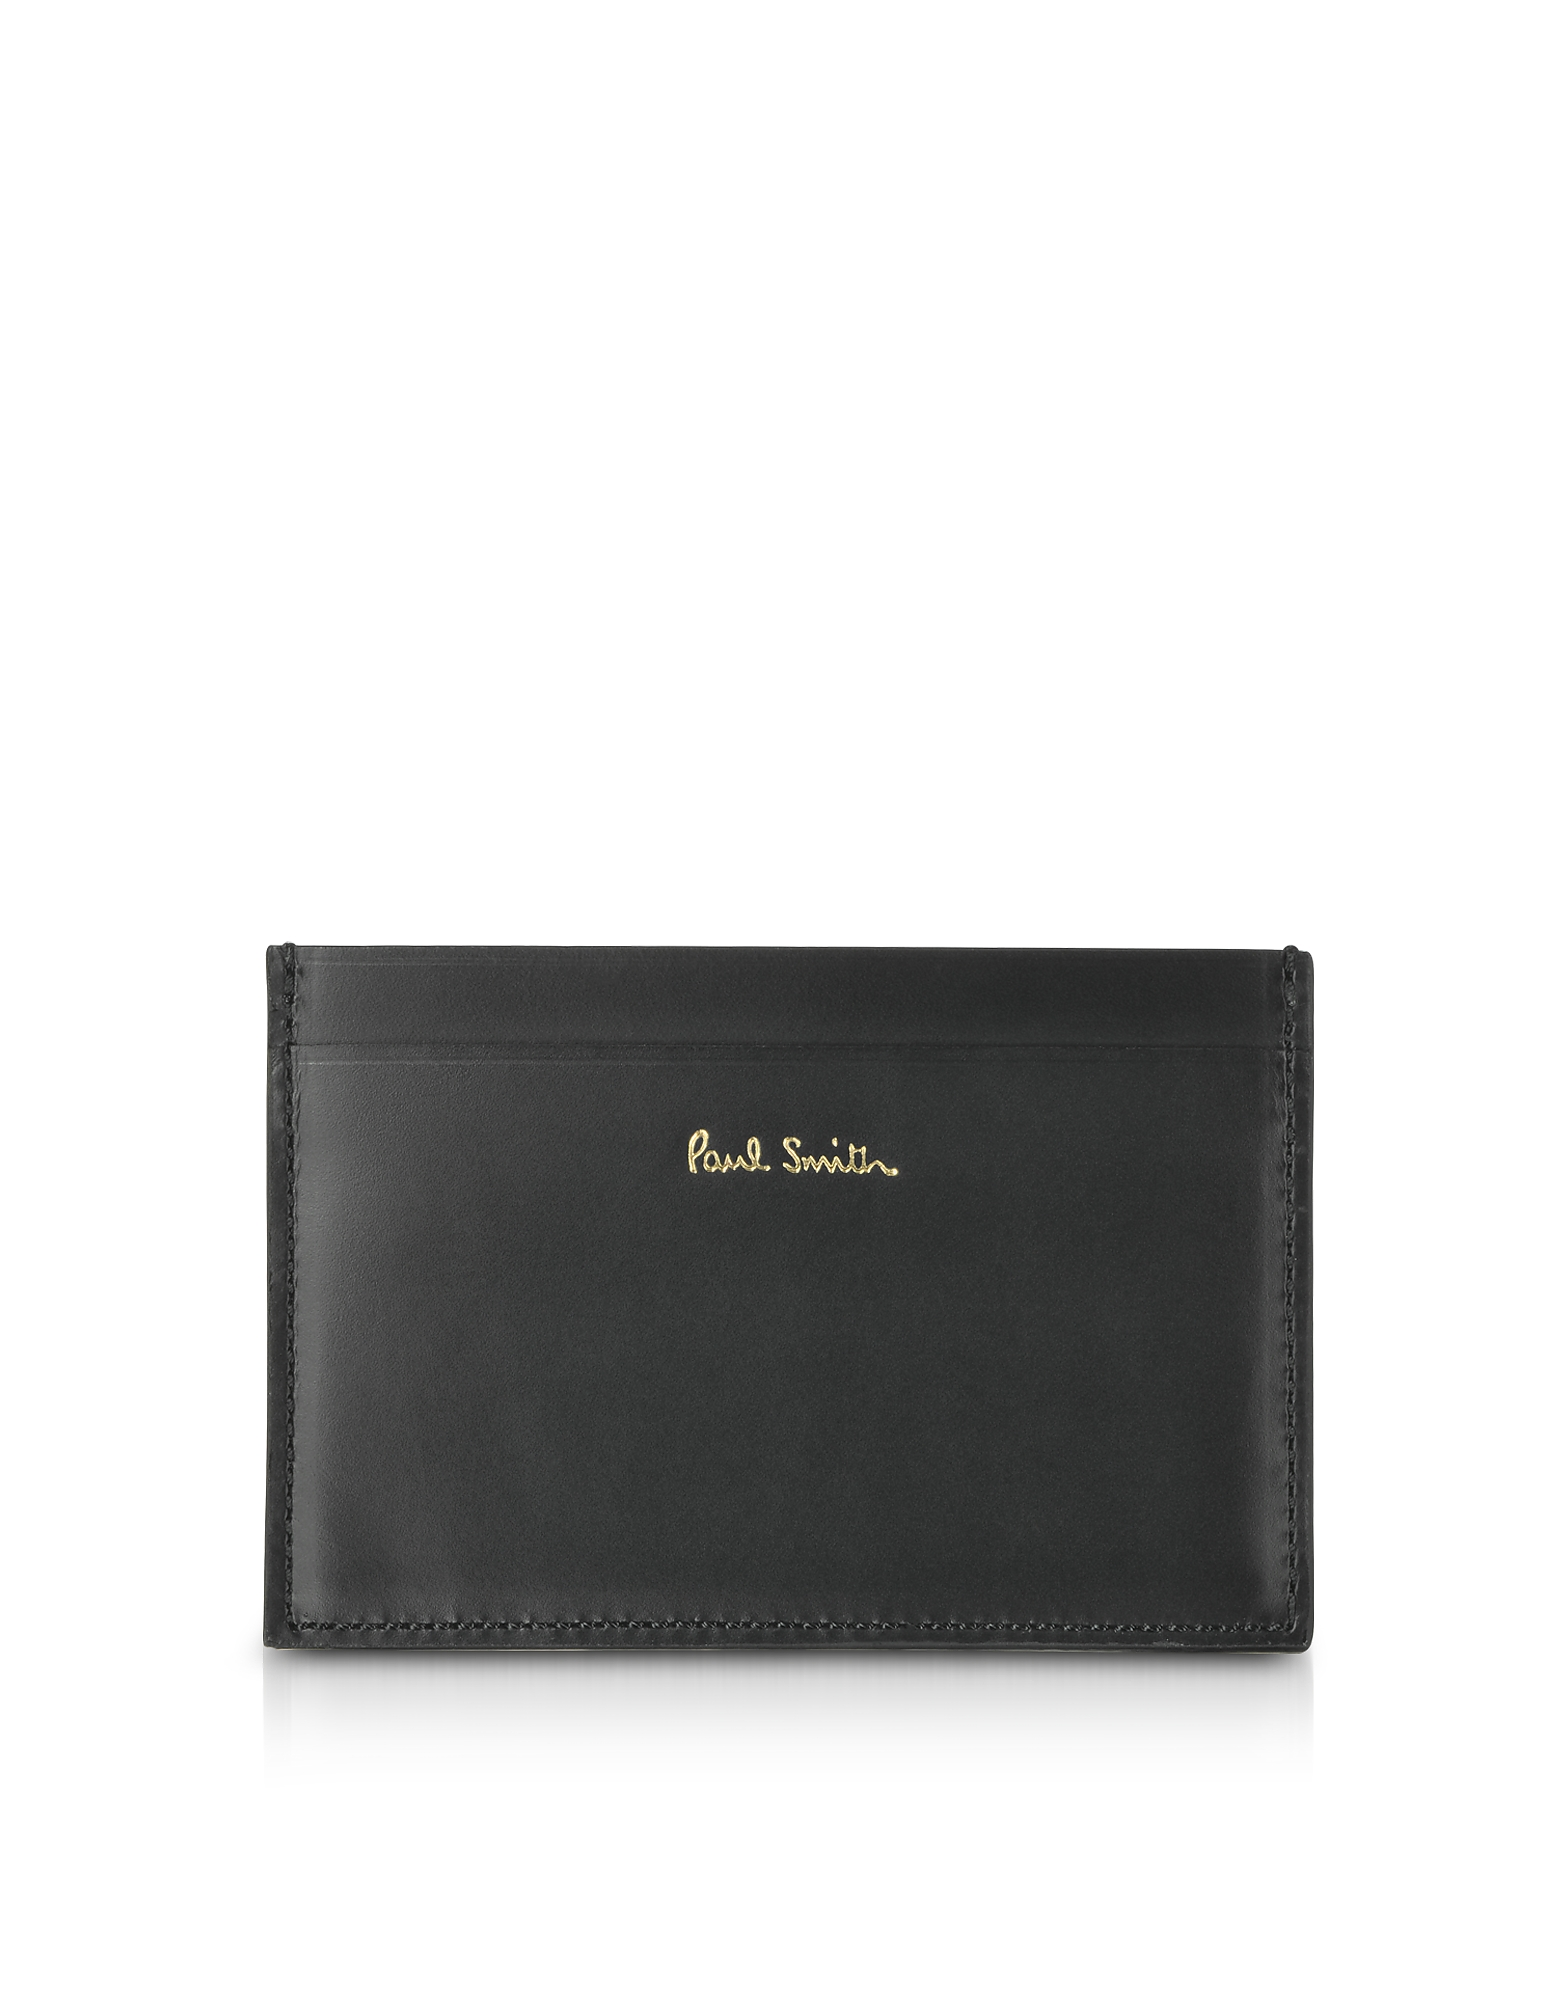 Image of Paul Smith Designer Wallets, Black Mini Print Leather Men's Credit Card Holder